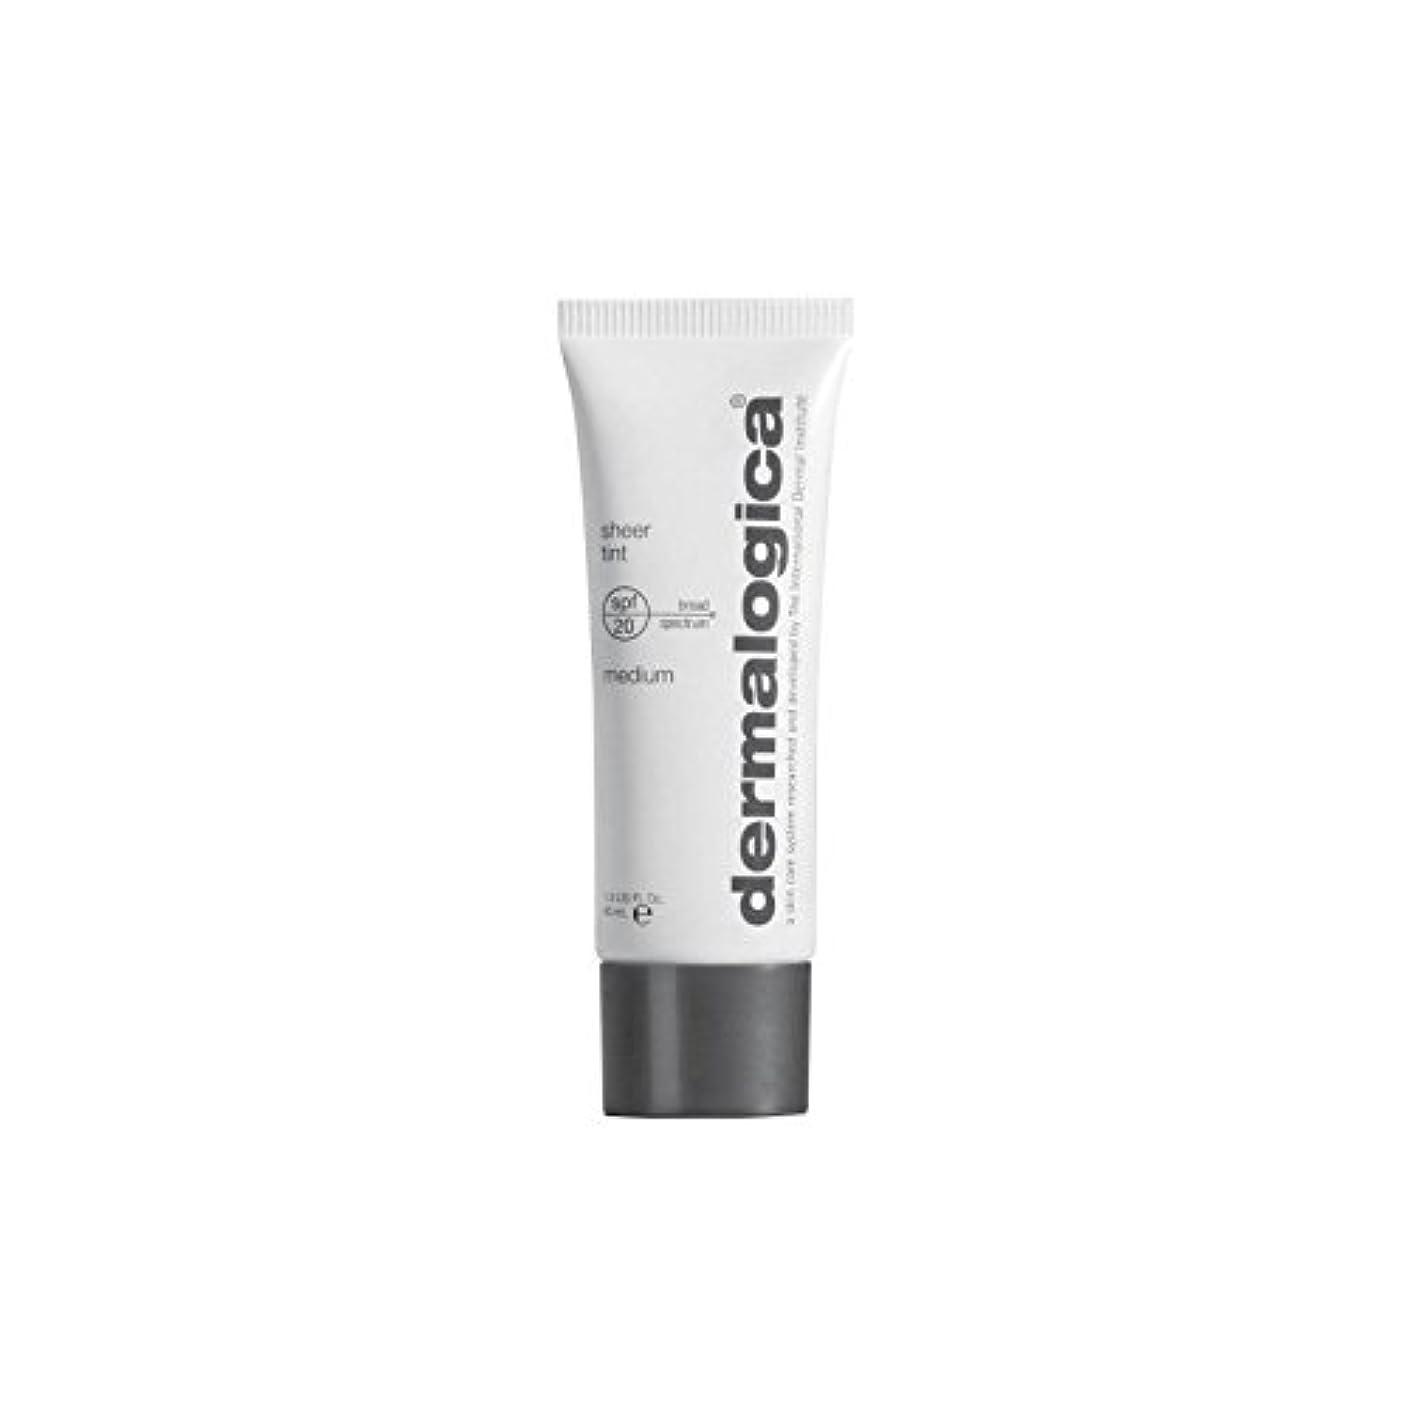 Dermalogica Sheer Tint Spf 20- Medium (Pack of 6) - ダーマロジカシアーティント 20-メディア x6 [並行輸入品]